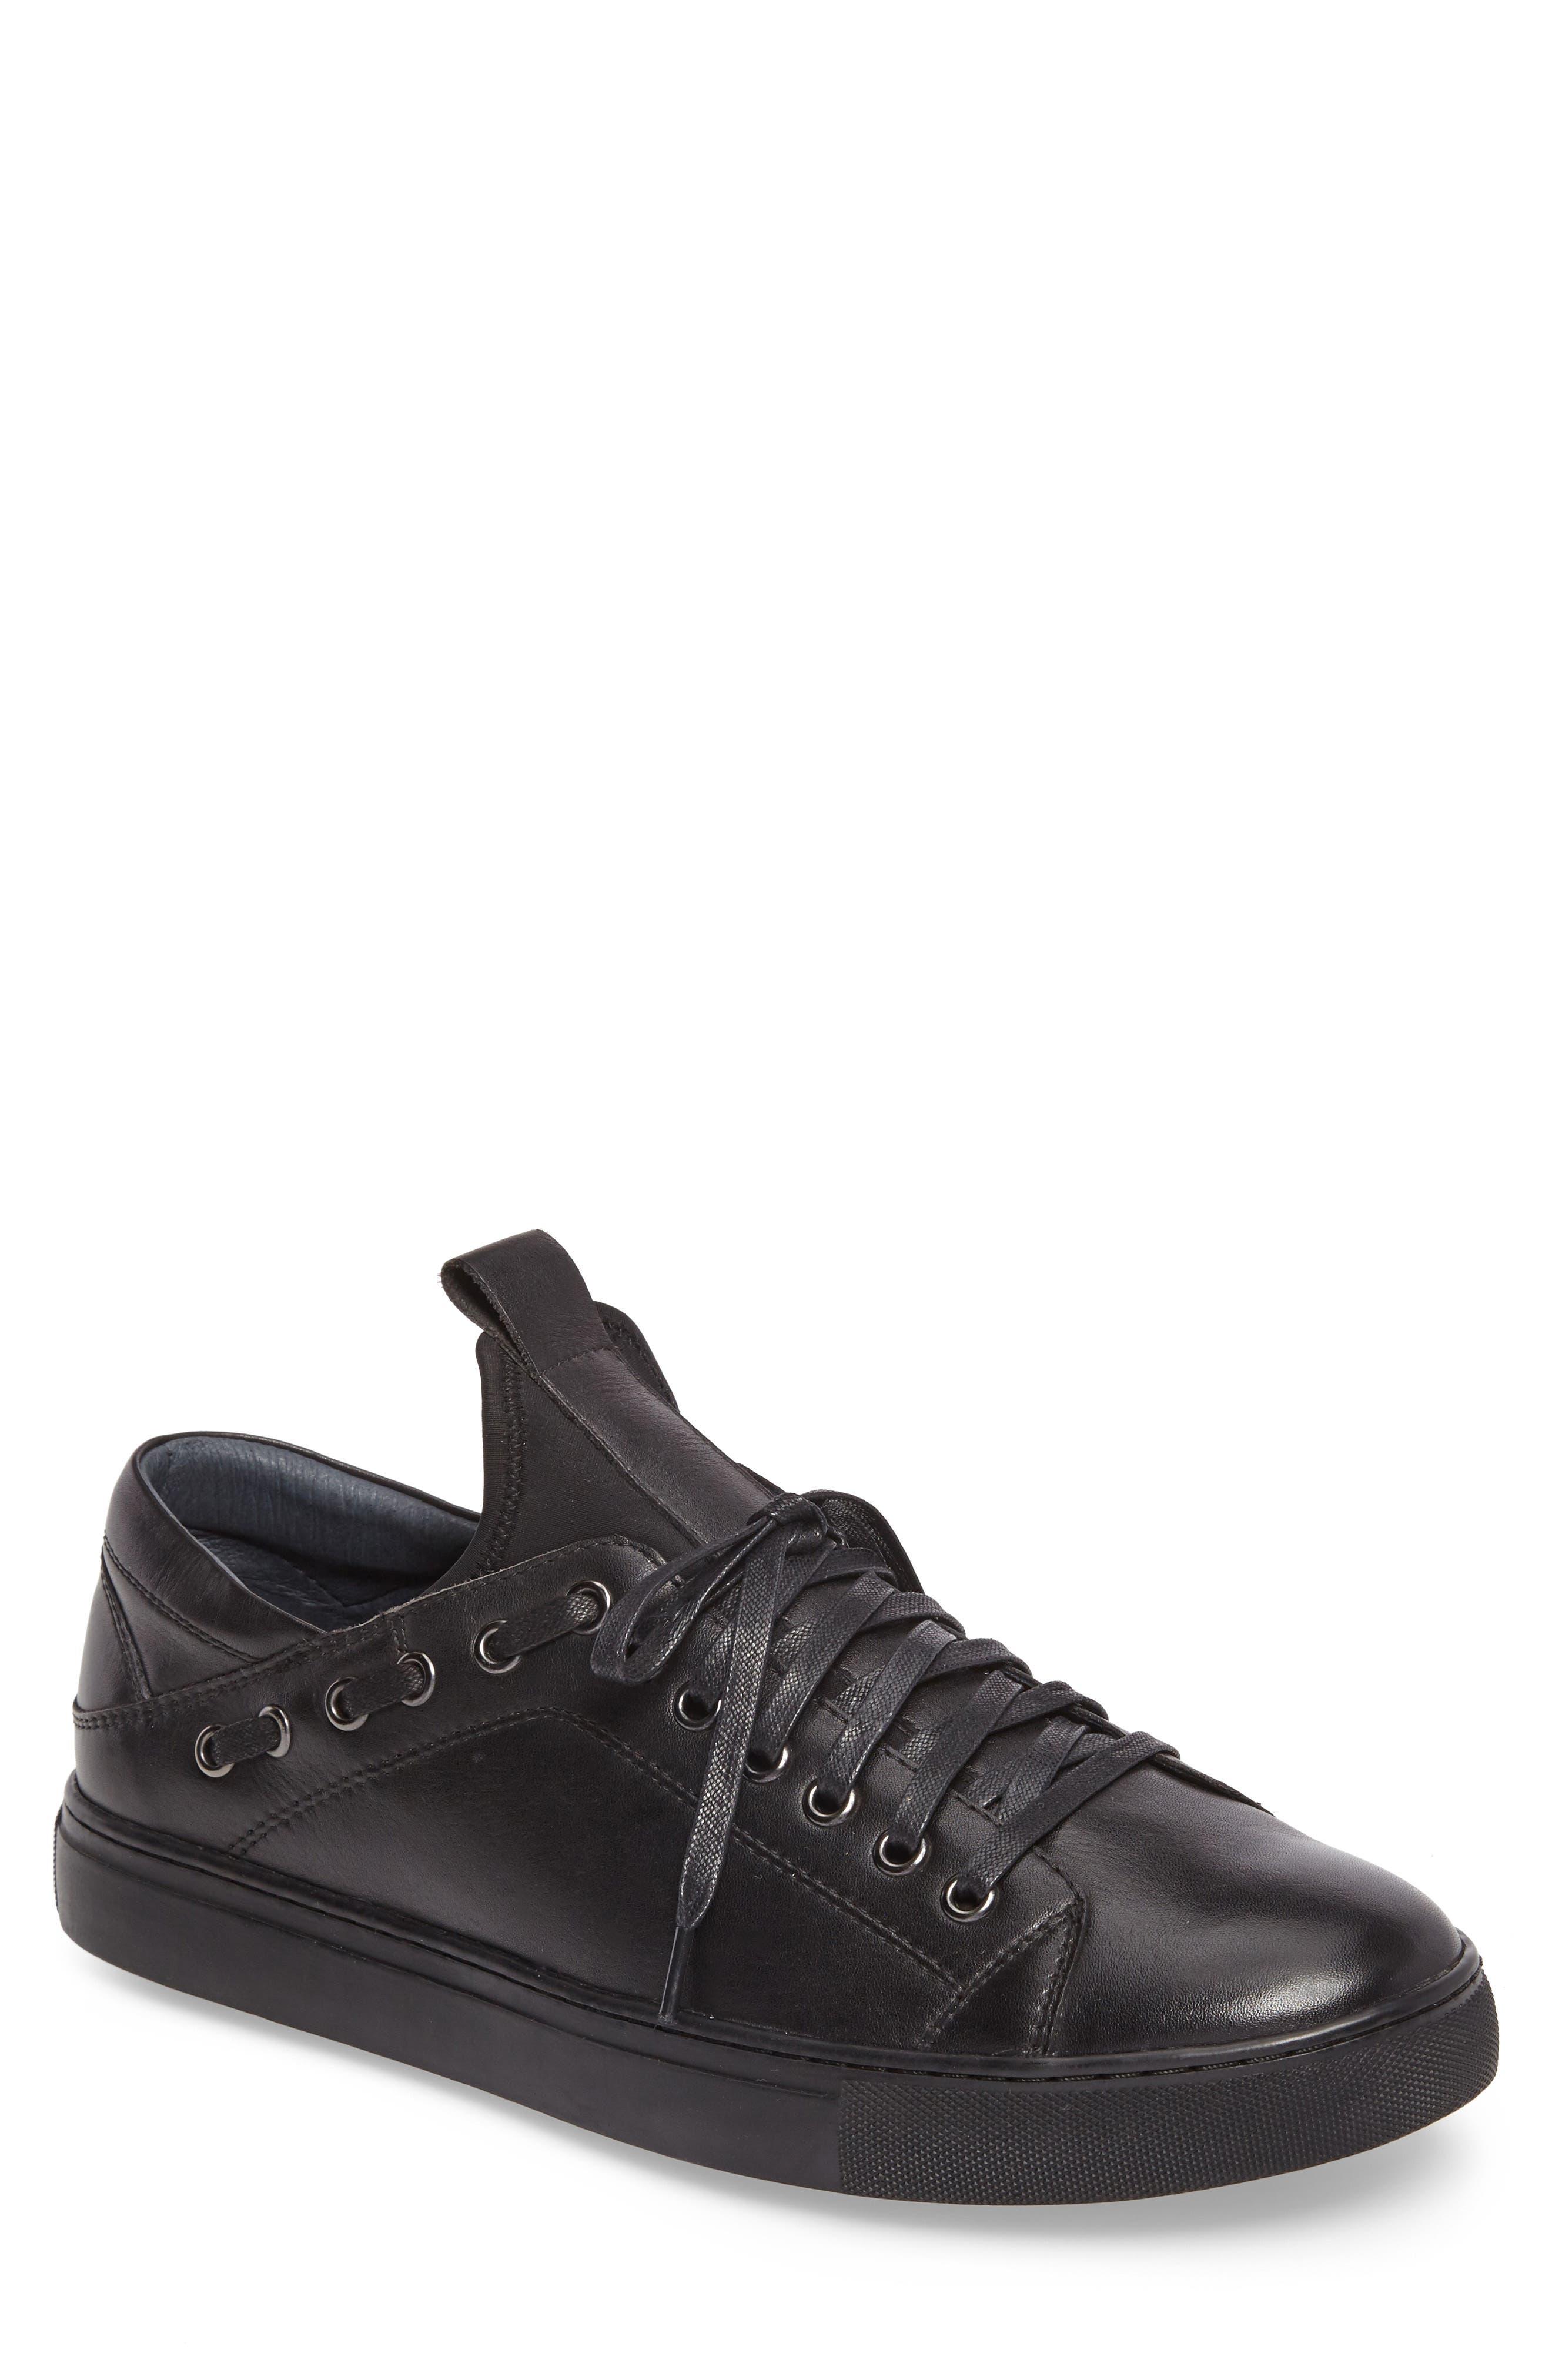 Owen Sneaker,                         Main,                         color,